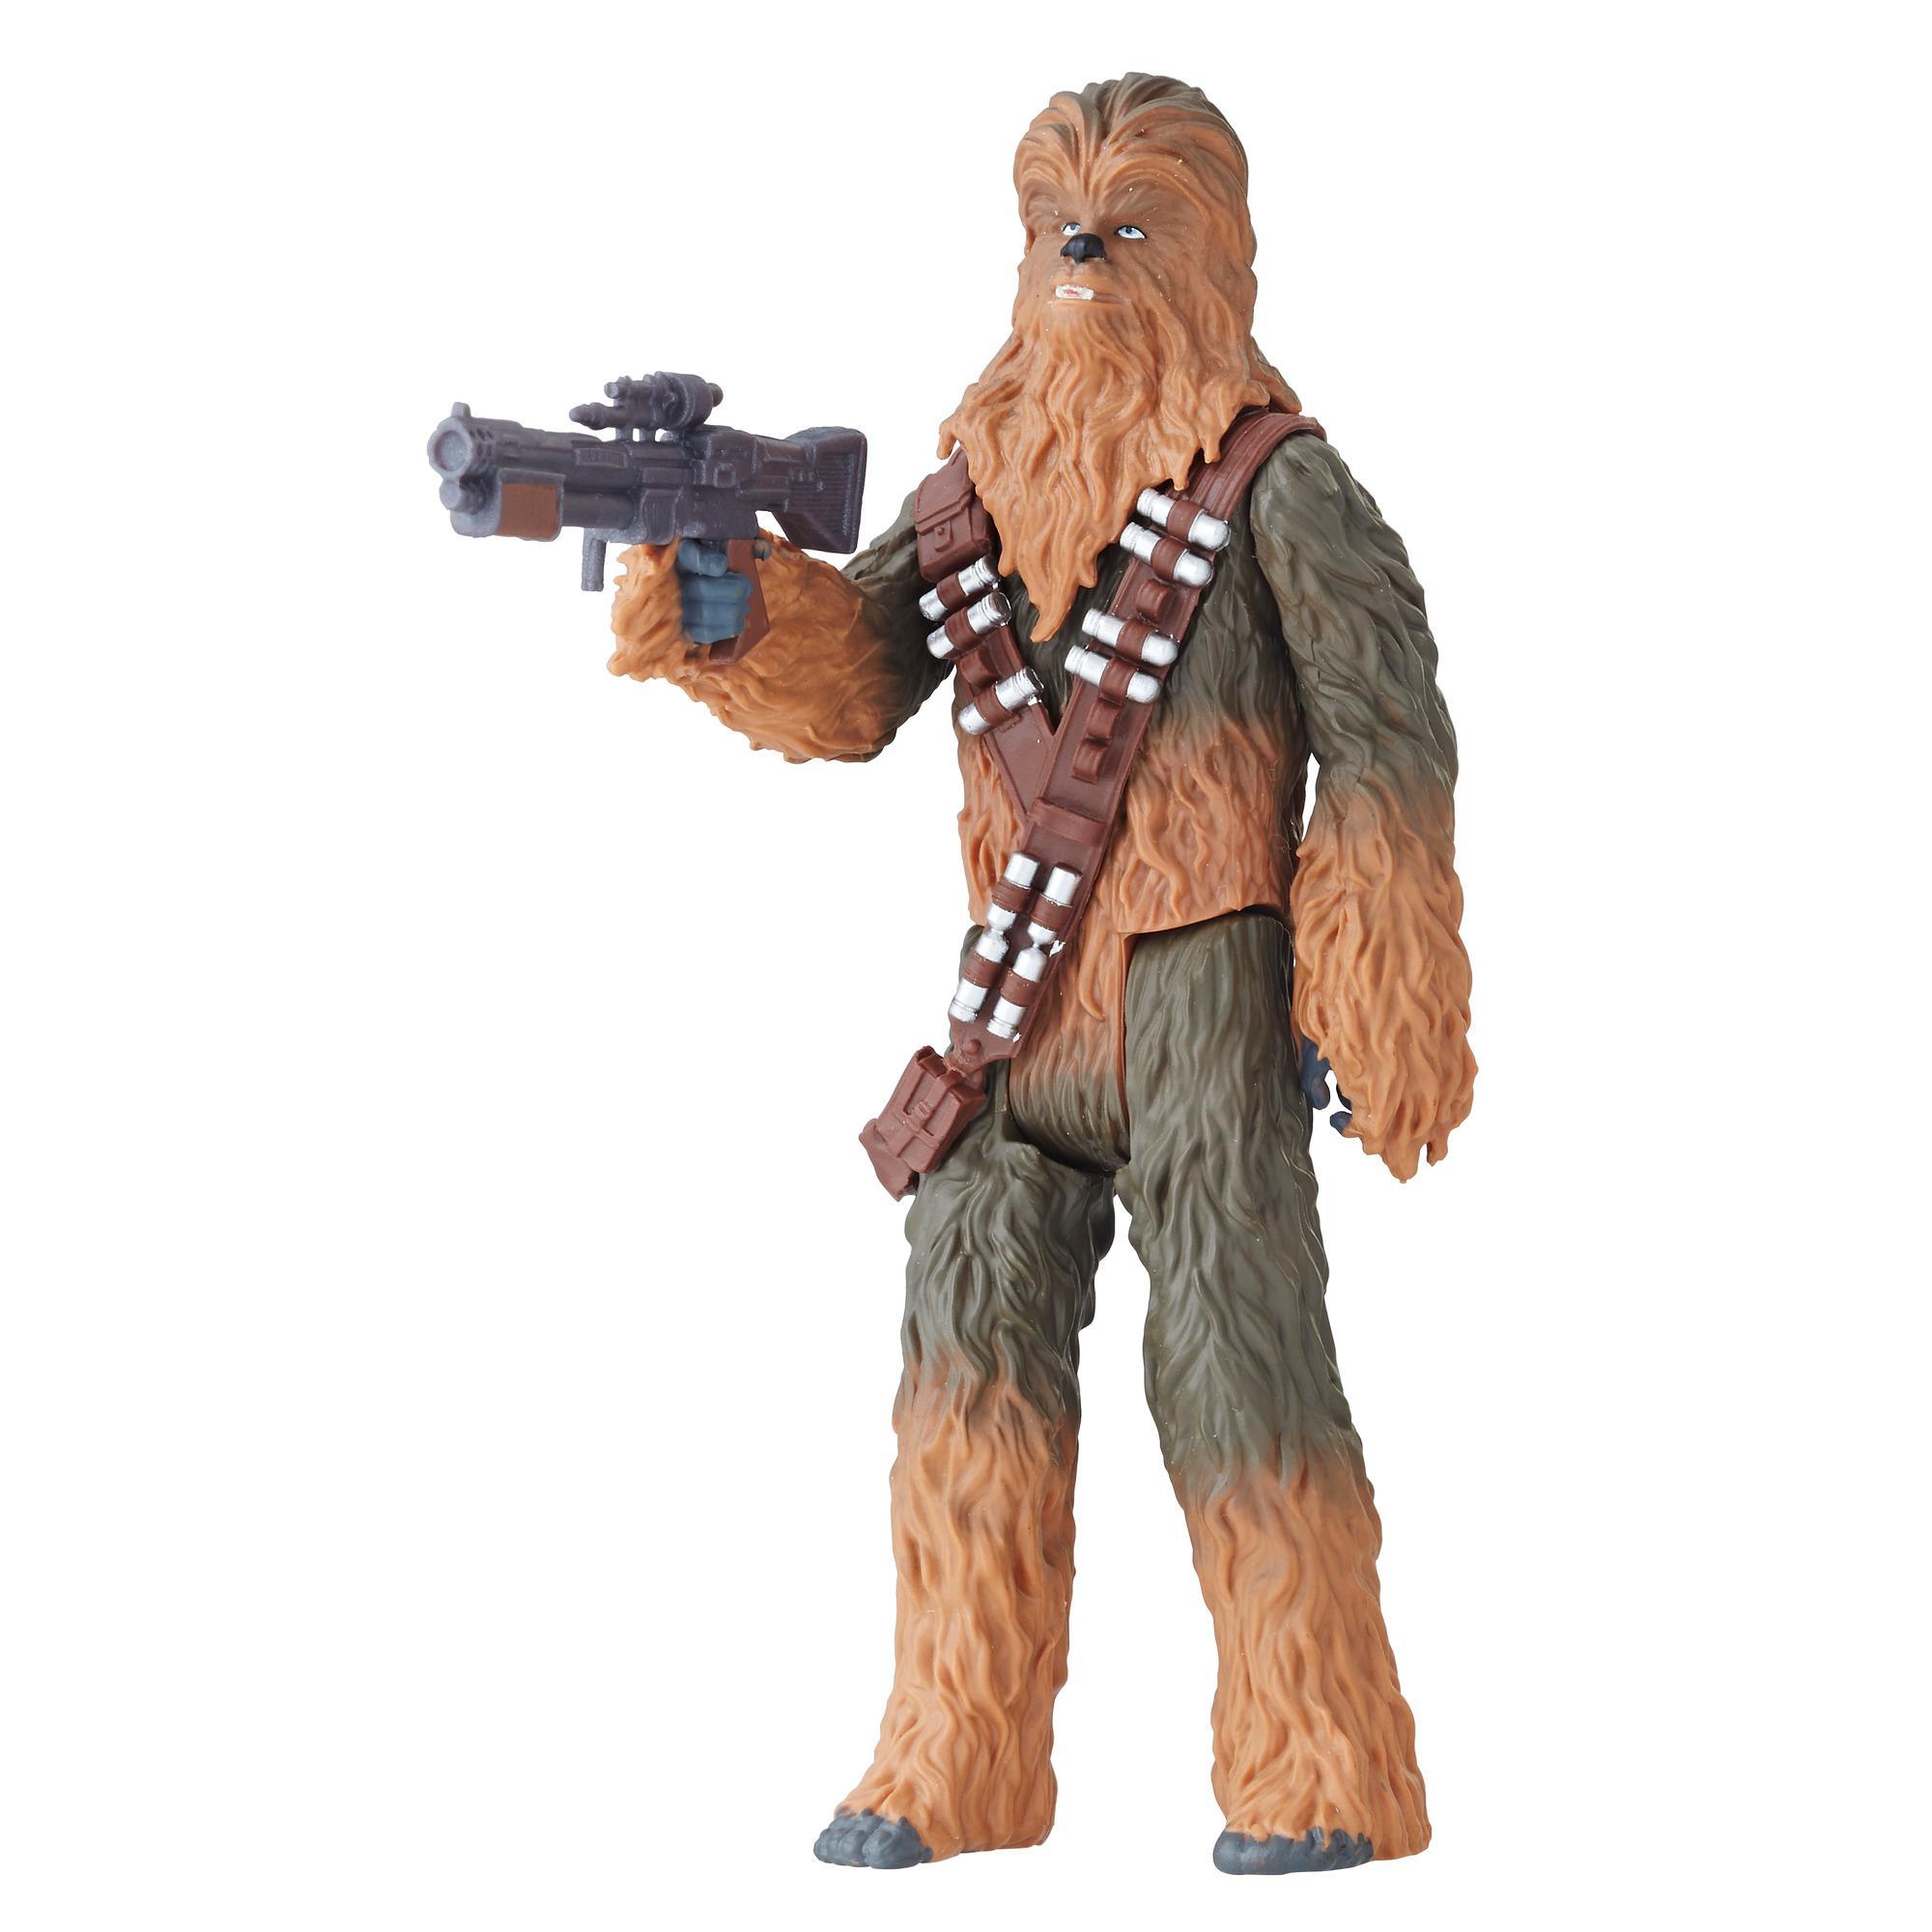 Star Wars Force Link 2.0 Chewbacca Figure